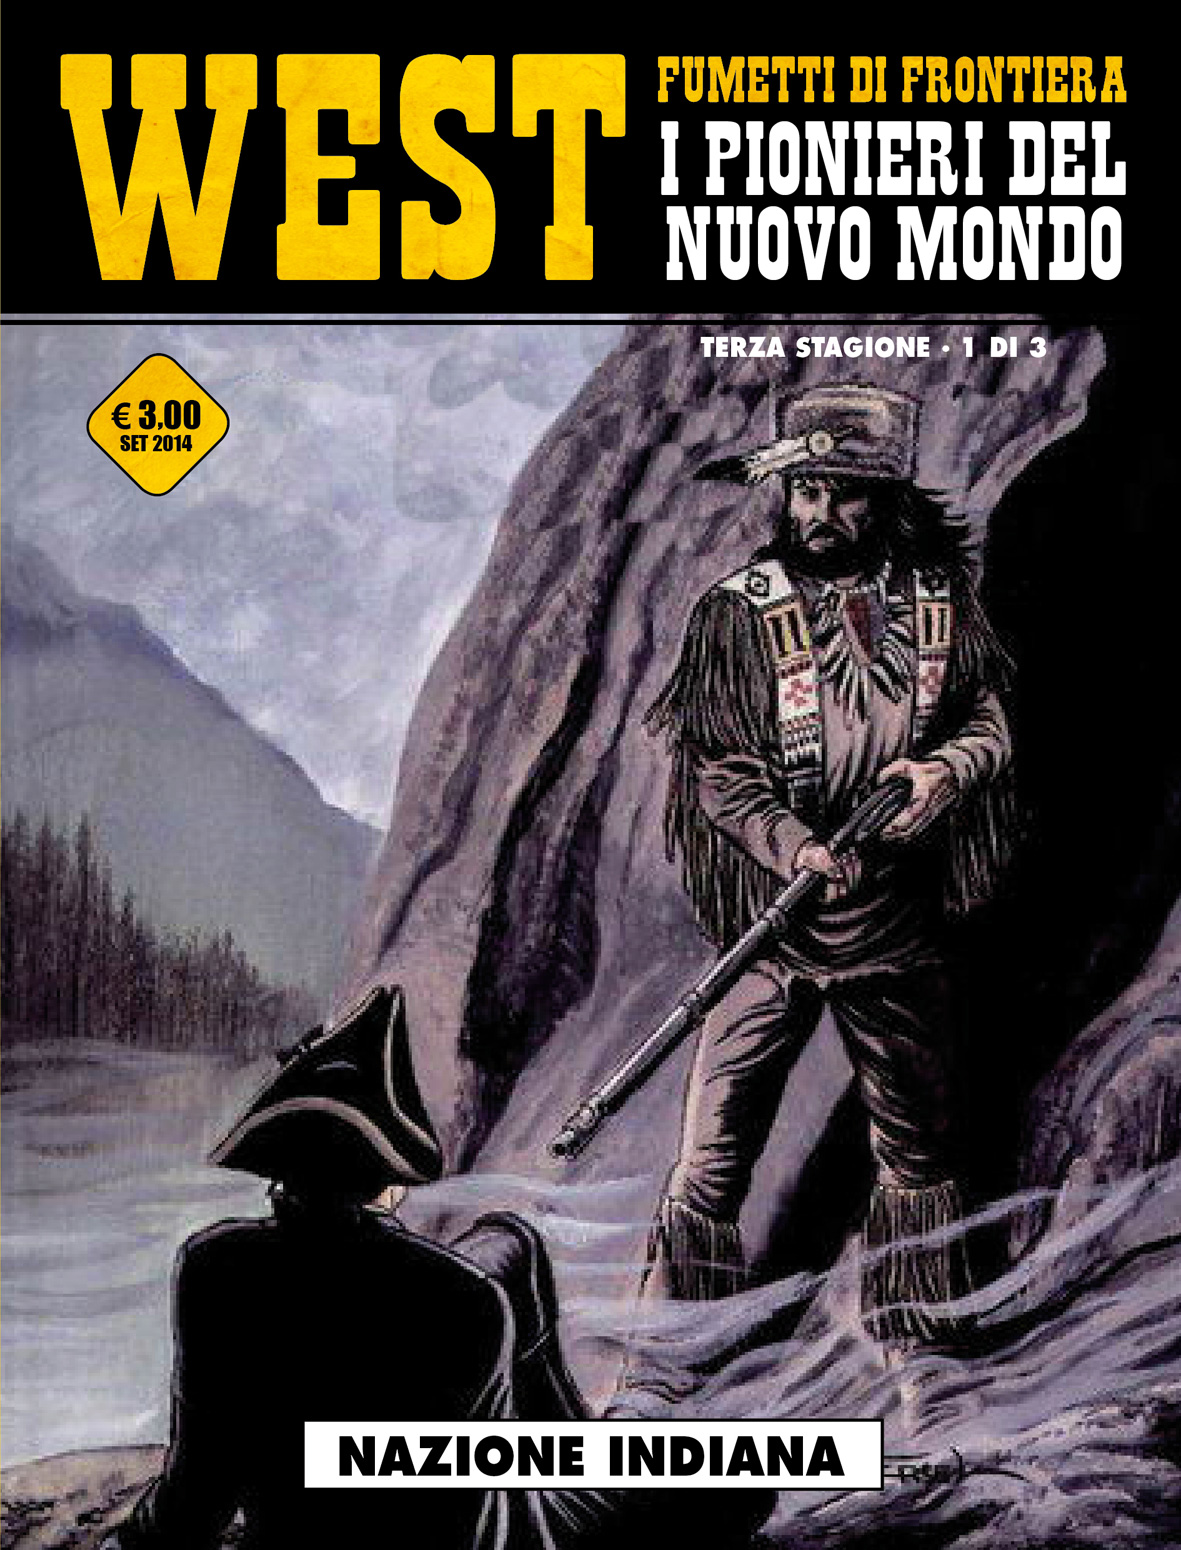 WEST - Fumetti di frontiera n. 15